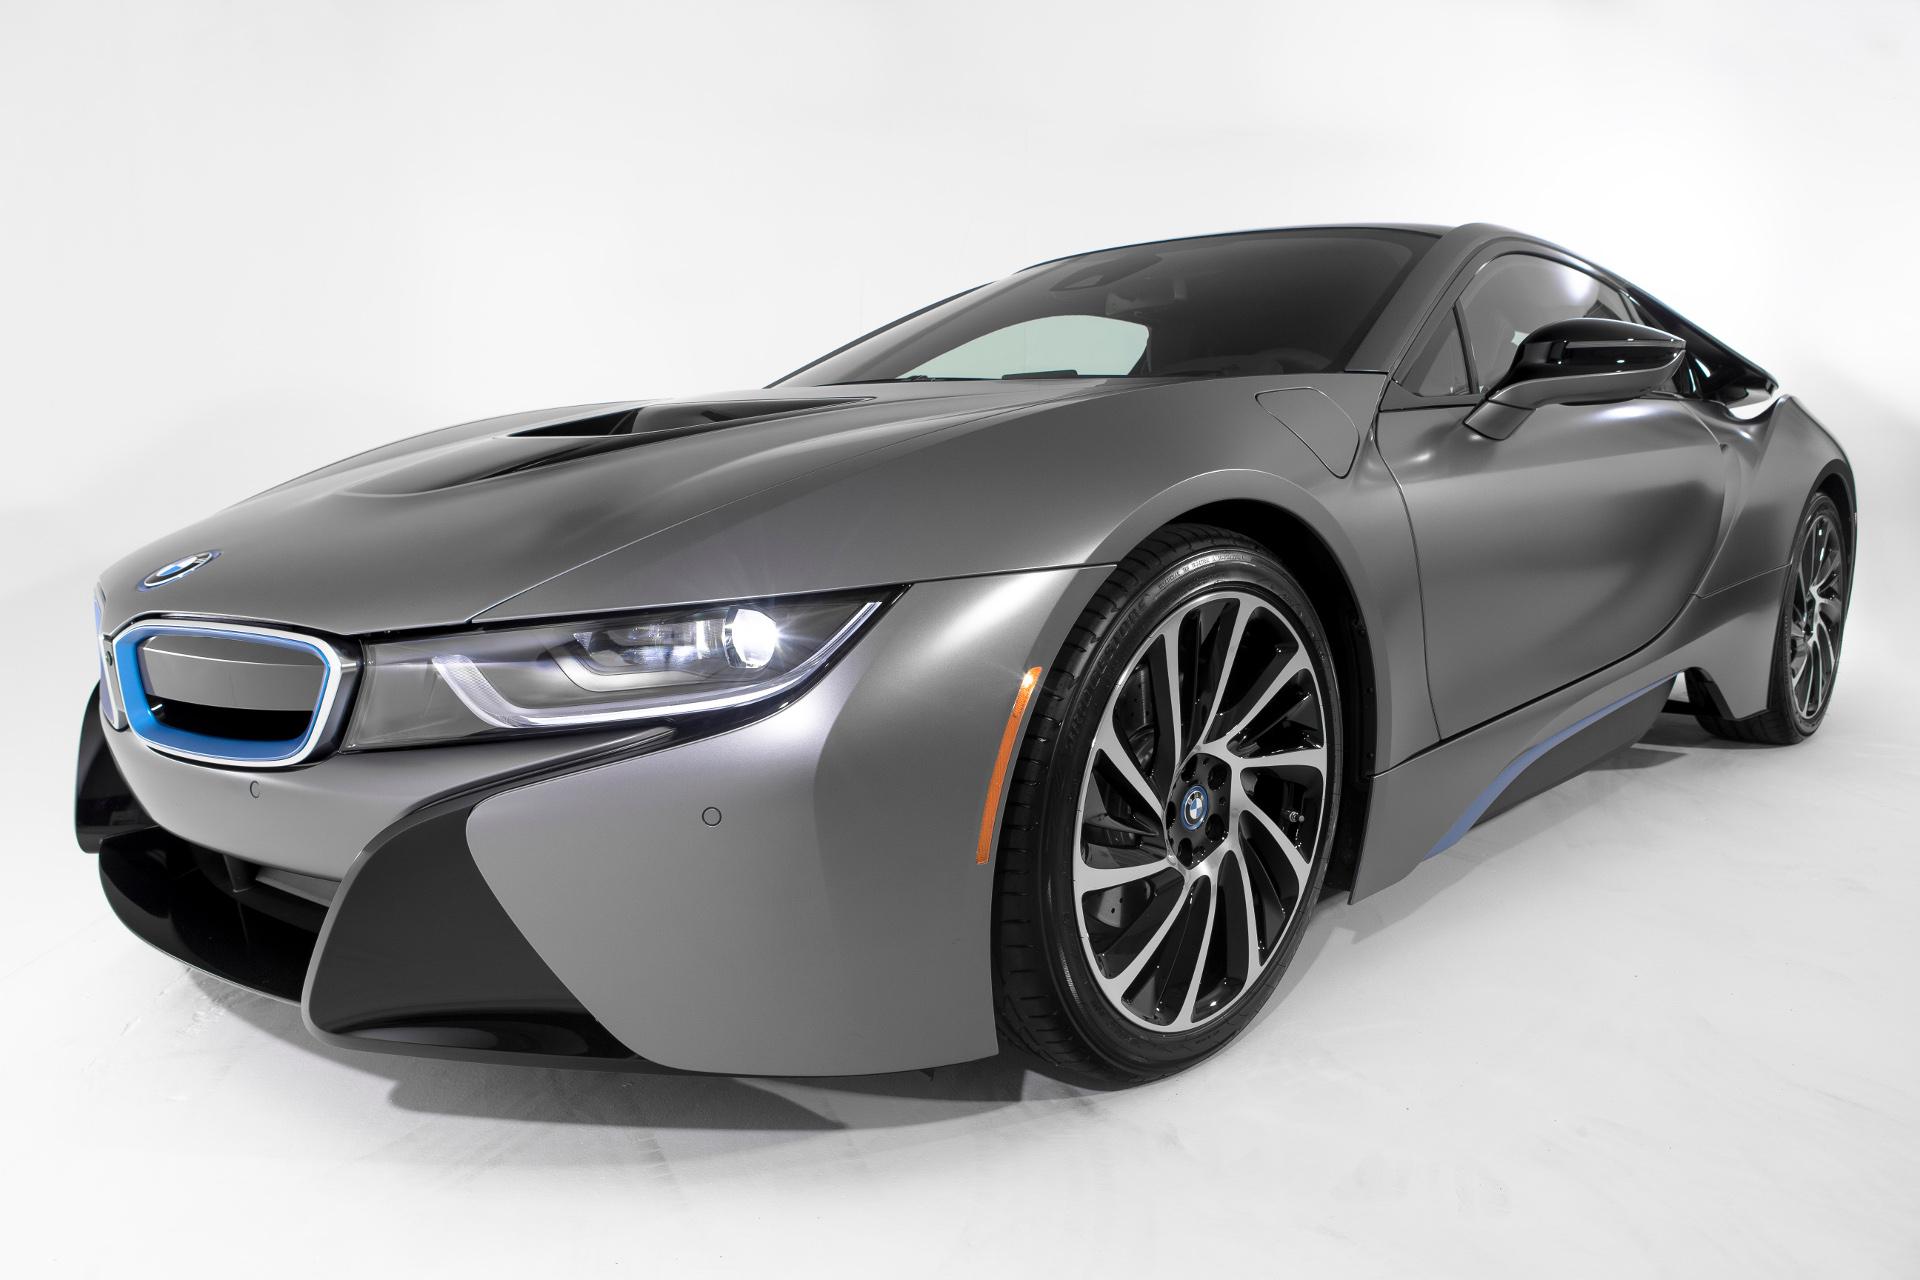 BMW i8 Concours d Elegance Edition 2014 Pebble Beach Frozen Grey 09